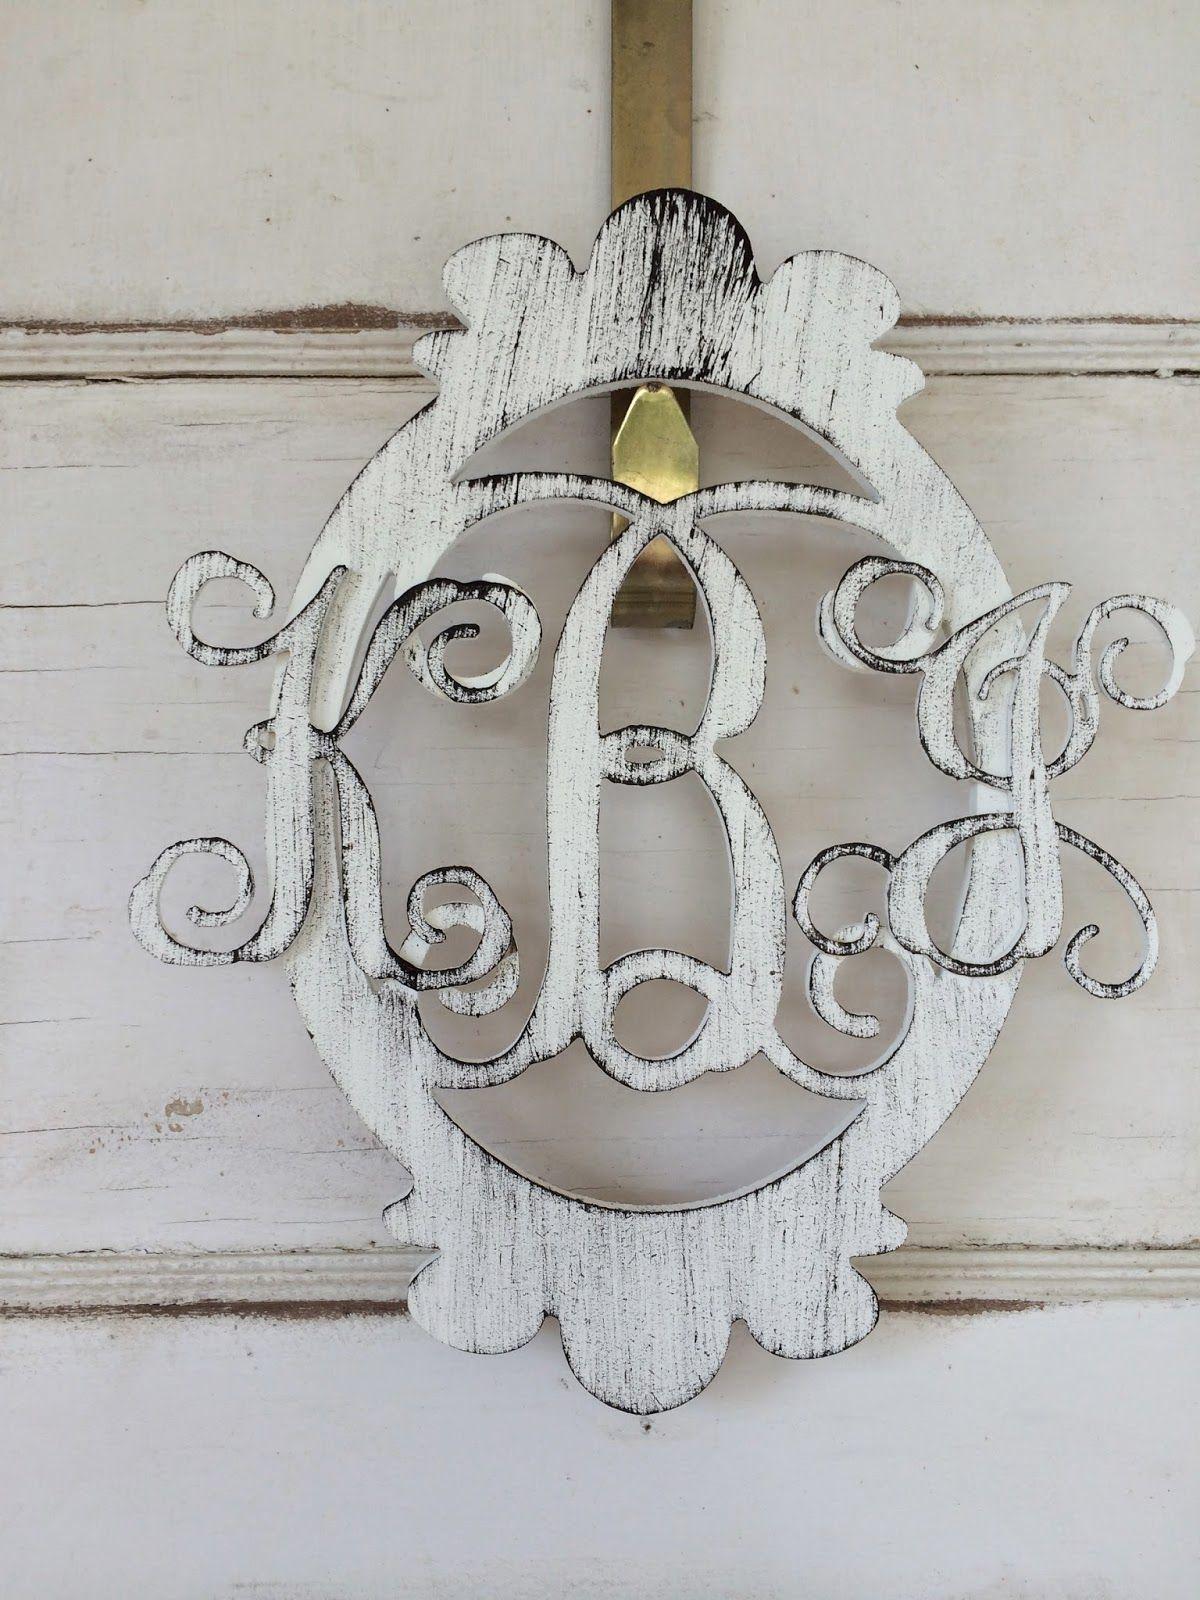 Unfinished wooden crosses for crafts - Build A Cross Unfinished Wooden Crosses Shapes Alphabet Letters Diy Crafts